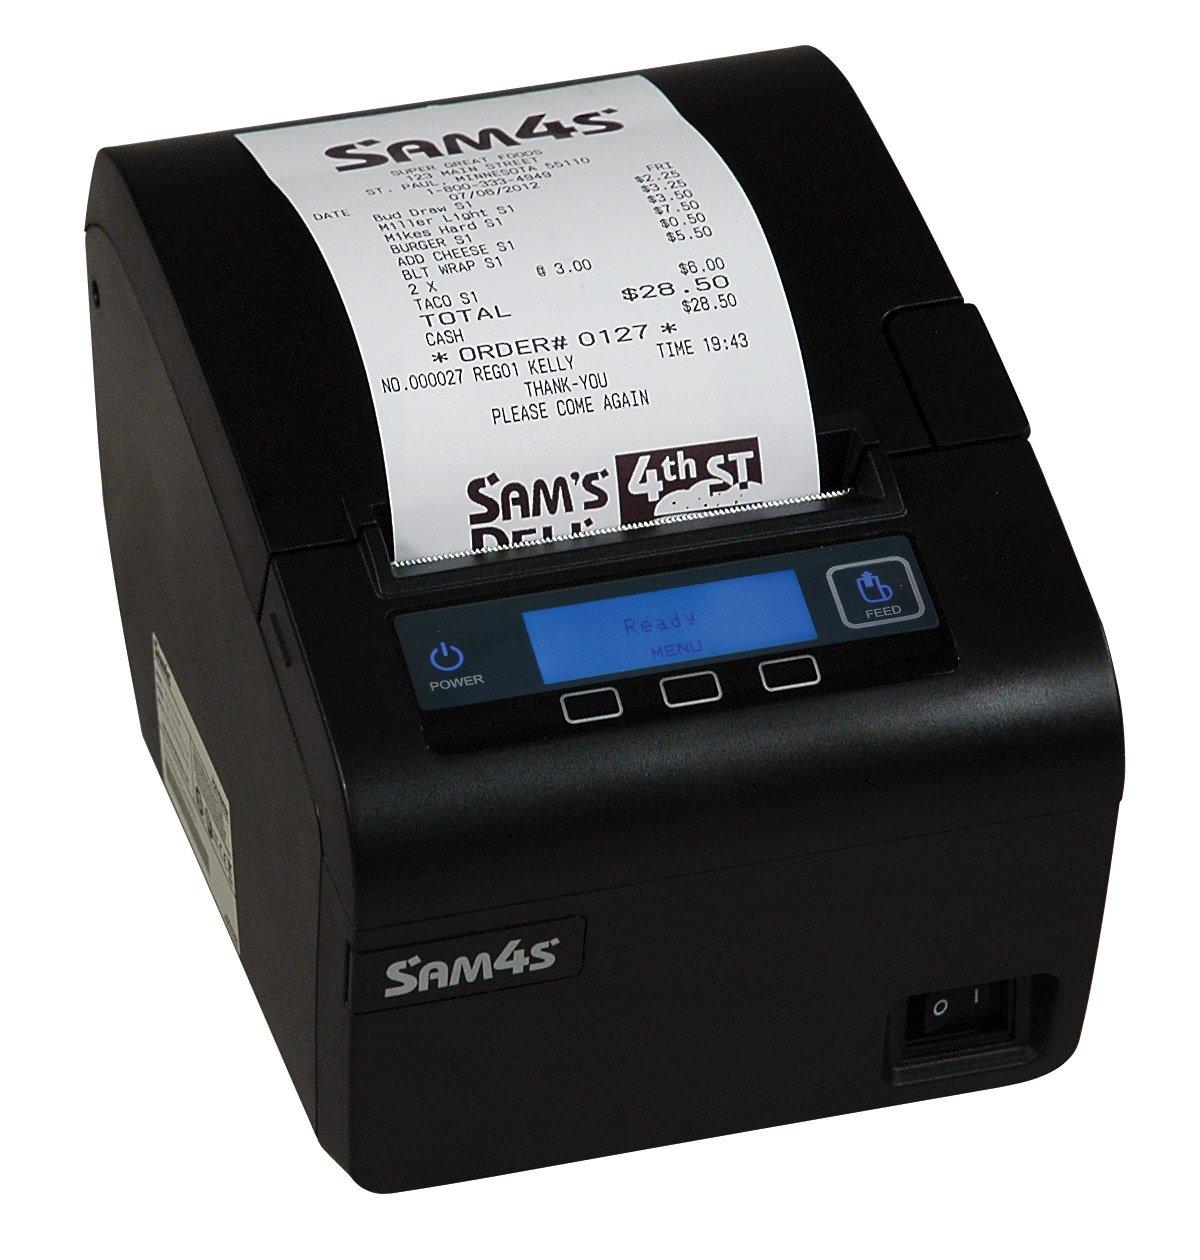 Sam4s Ellix 40 Black USB and Serial Thermal Receipt Printer